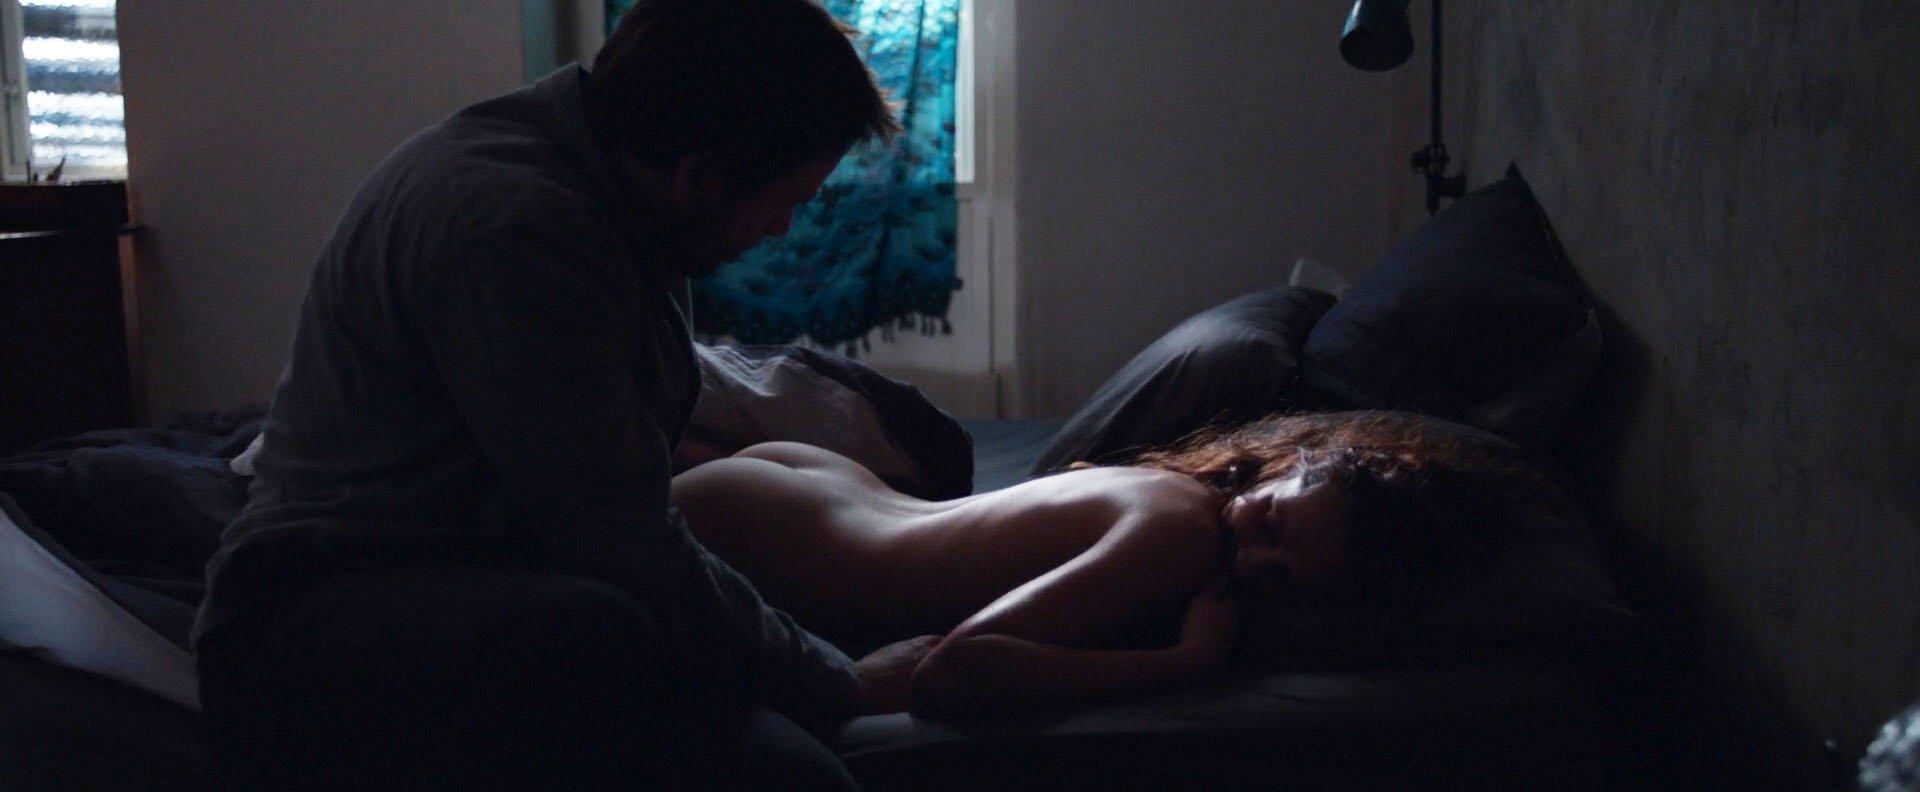 teresa palmer sex nude scene